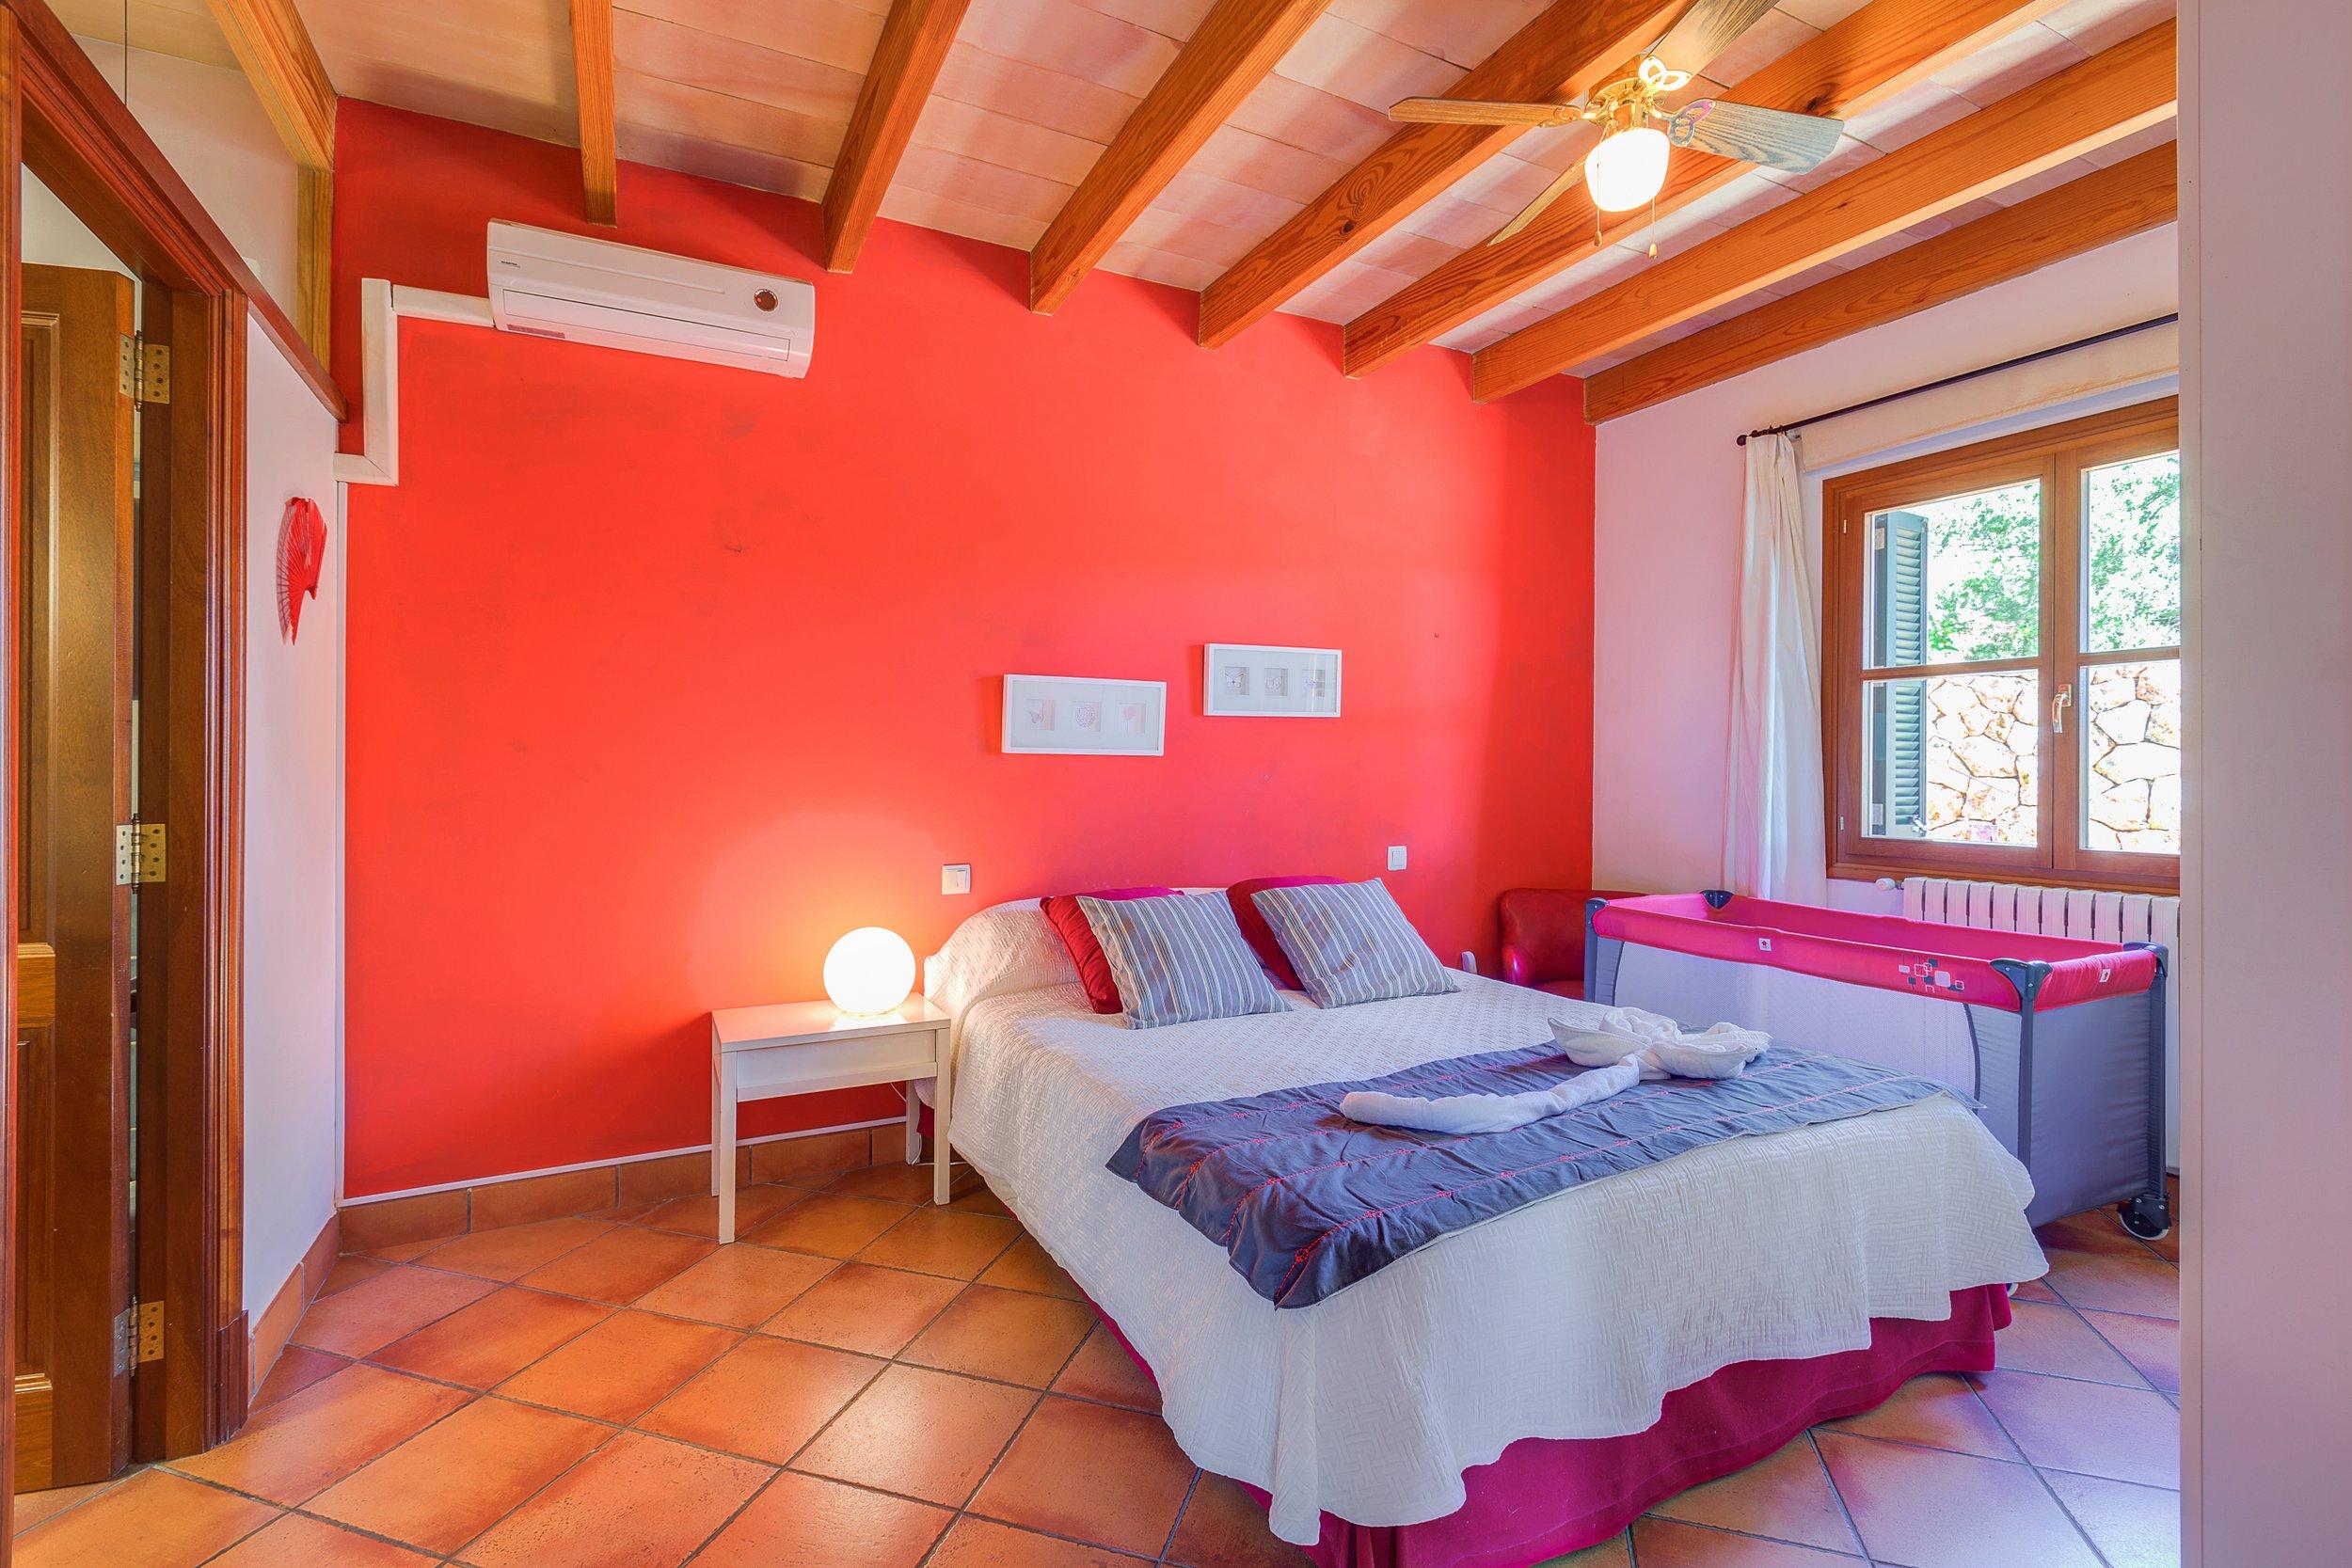 Maison de vacances Villa Cirera in Alaro (2611793), Alaro, Majorque, Iles Baléares, Espagne, image 26